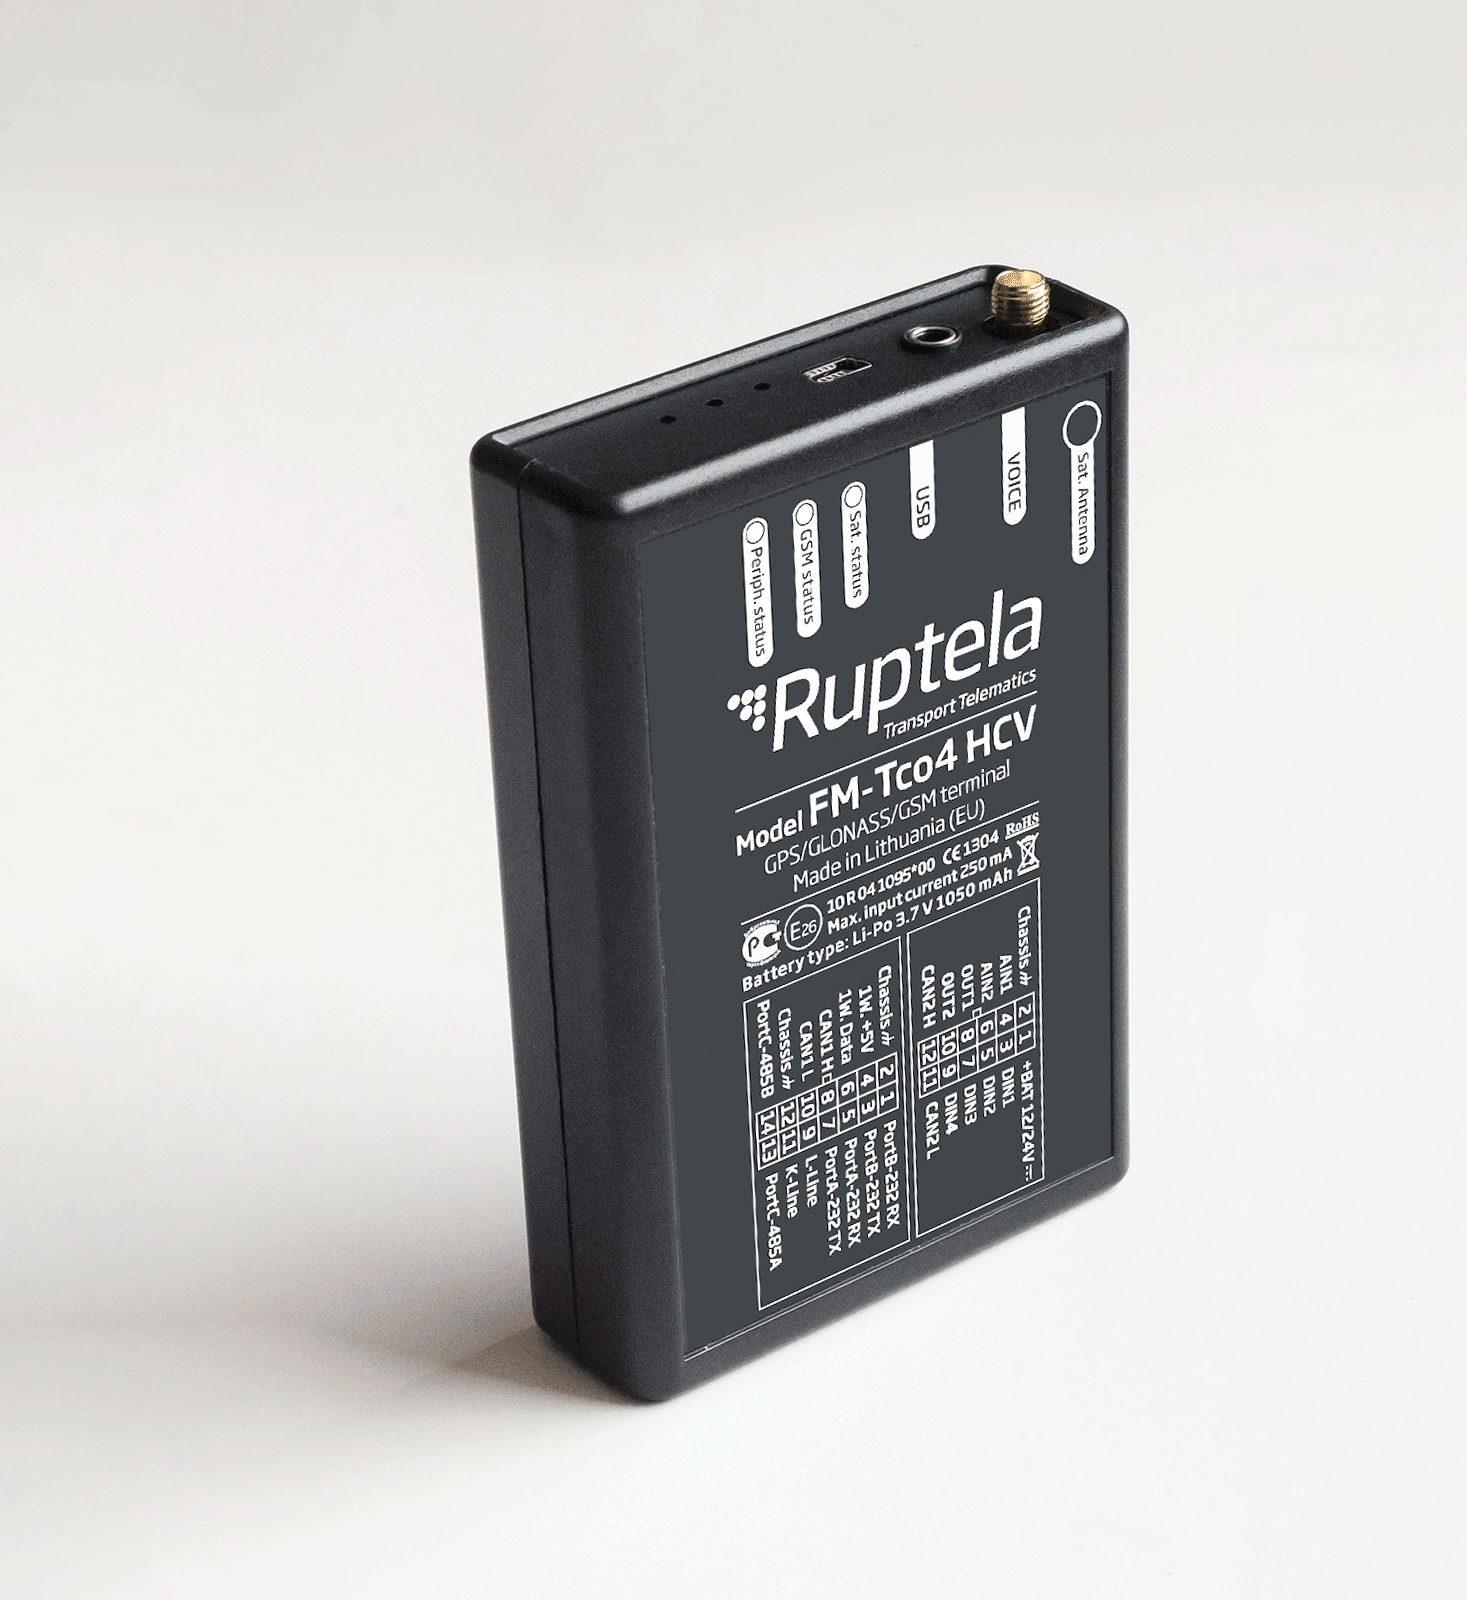 Ruptela-Tco4HCV-GPS-tracker